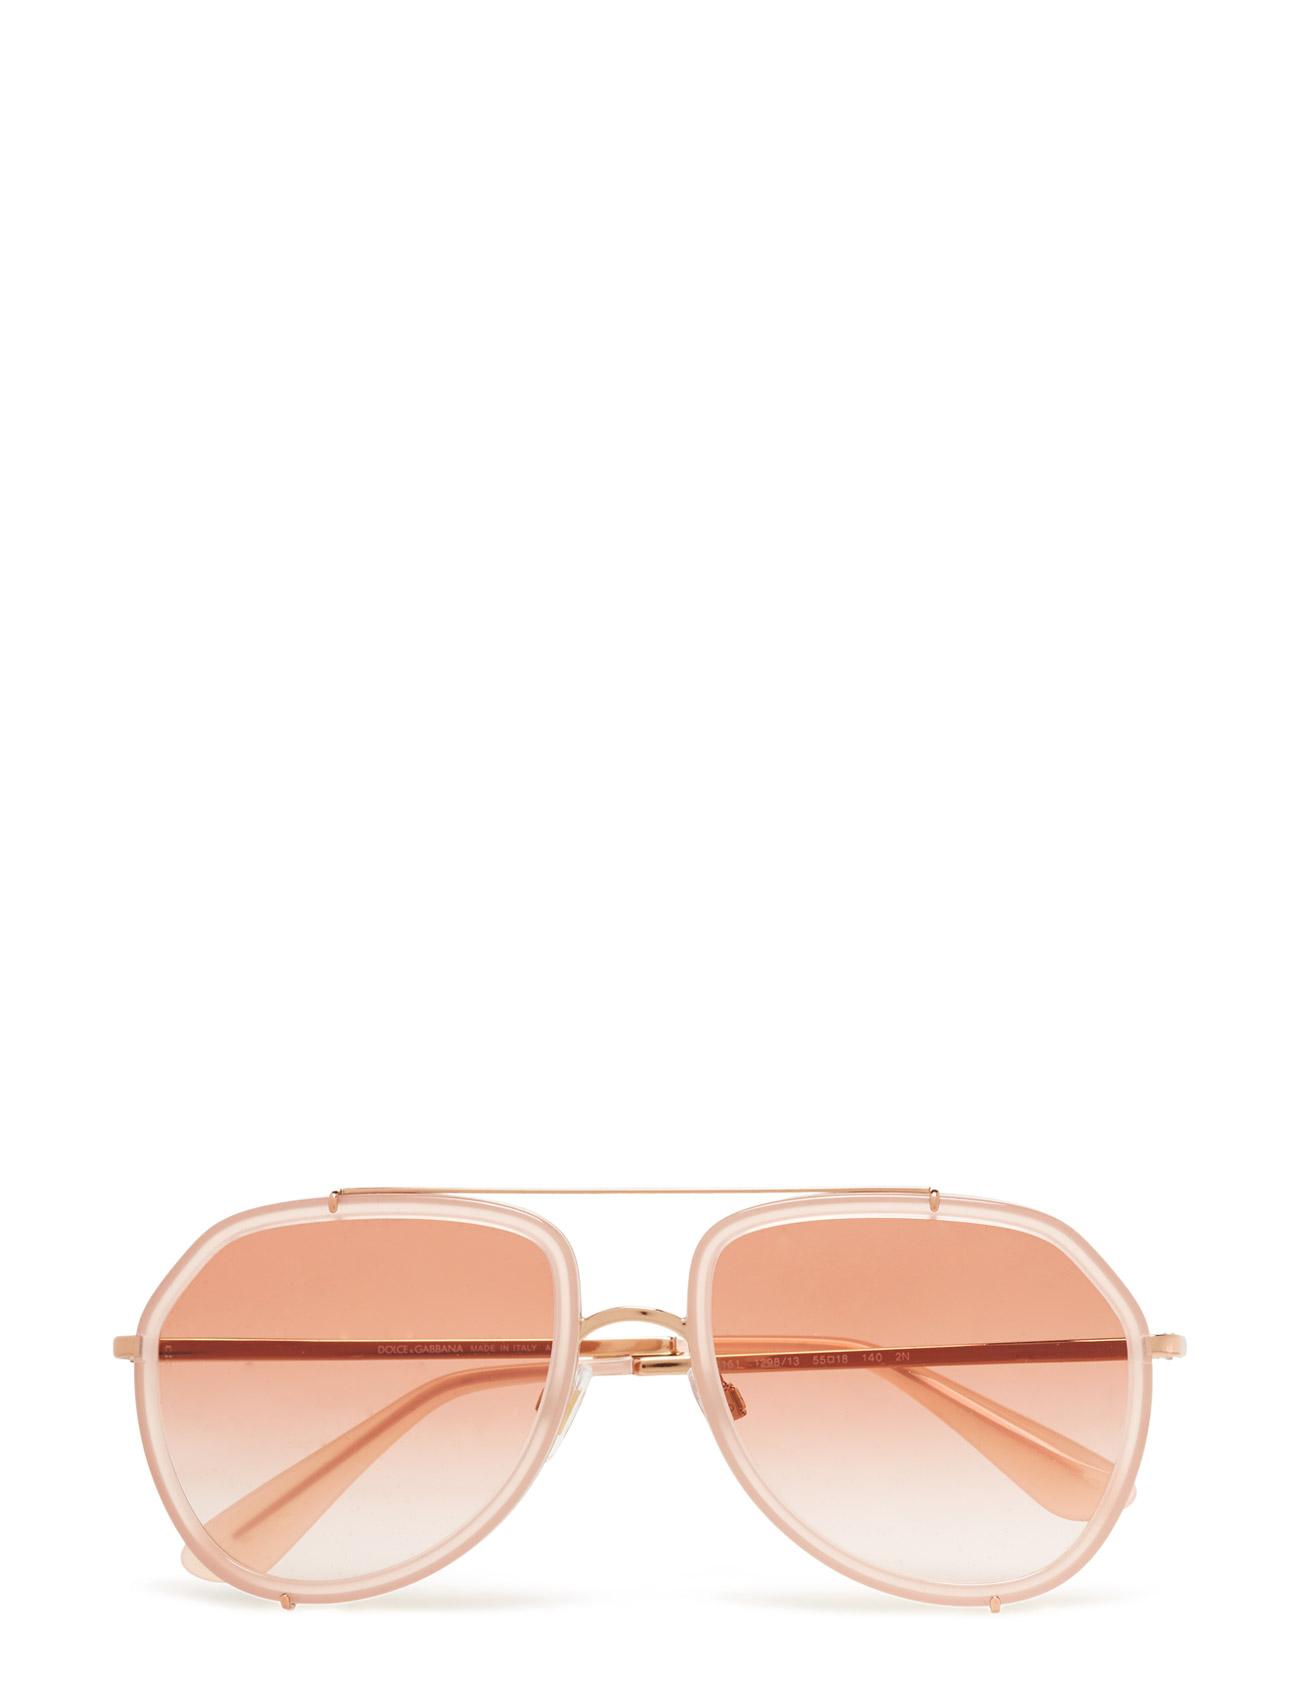 2a85f6c16190 Dolce   Gabbana Sunglasses Aviator (Opal Pink pink Gold)